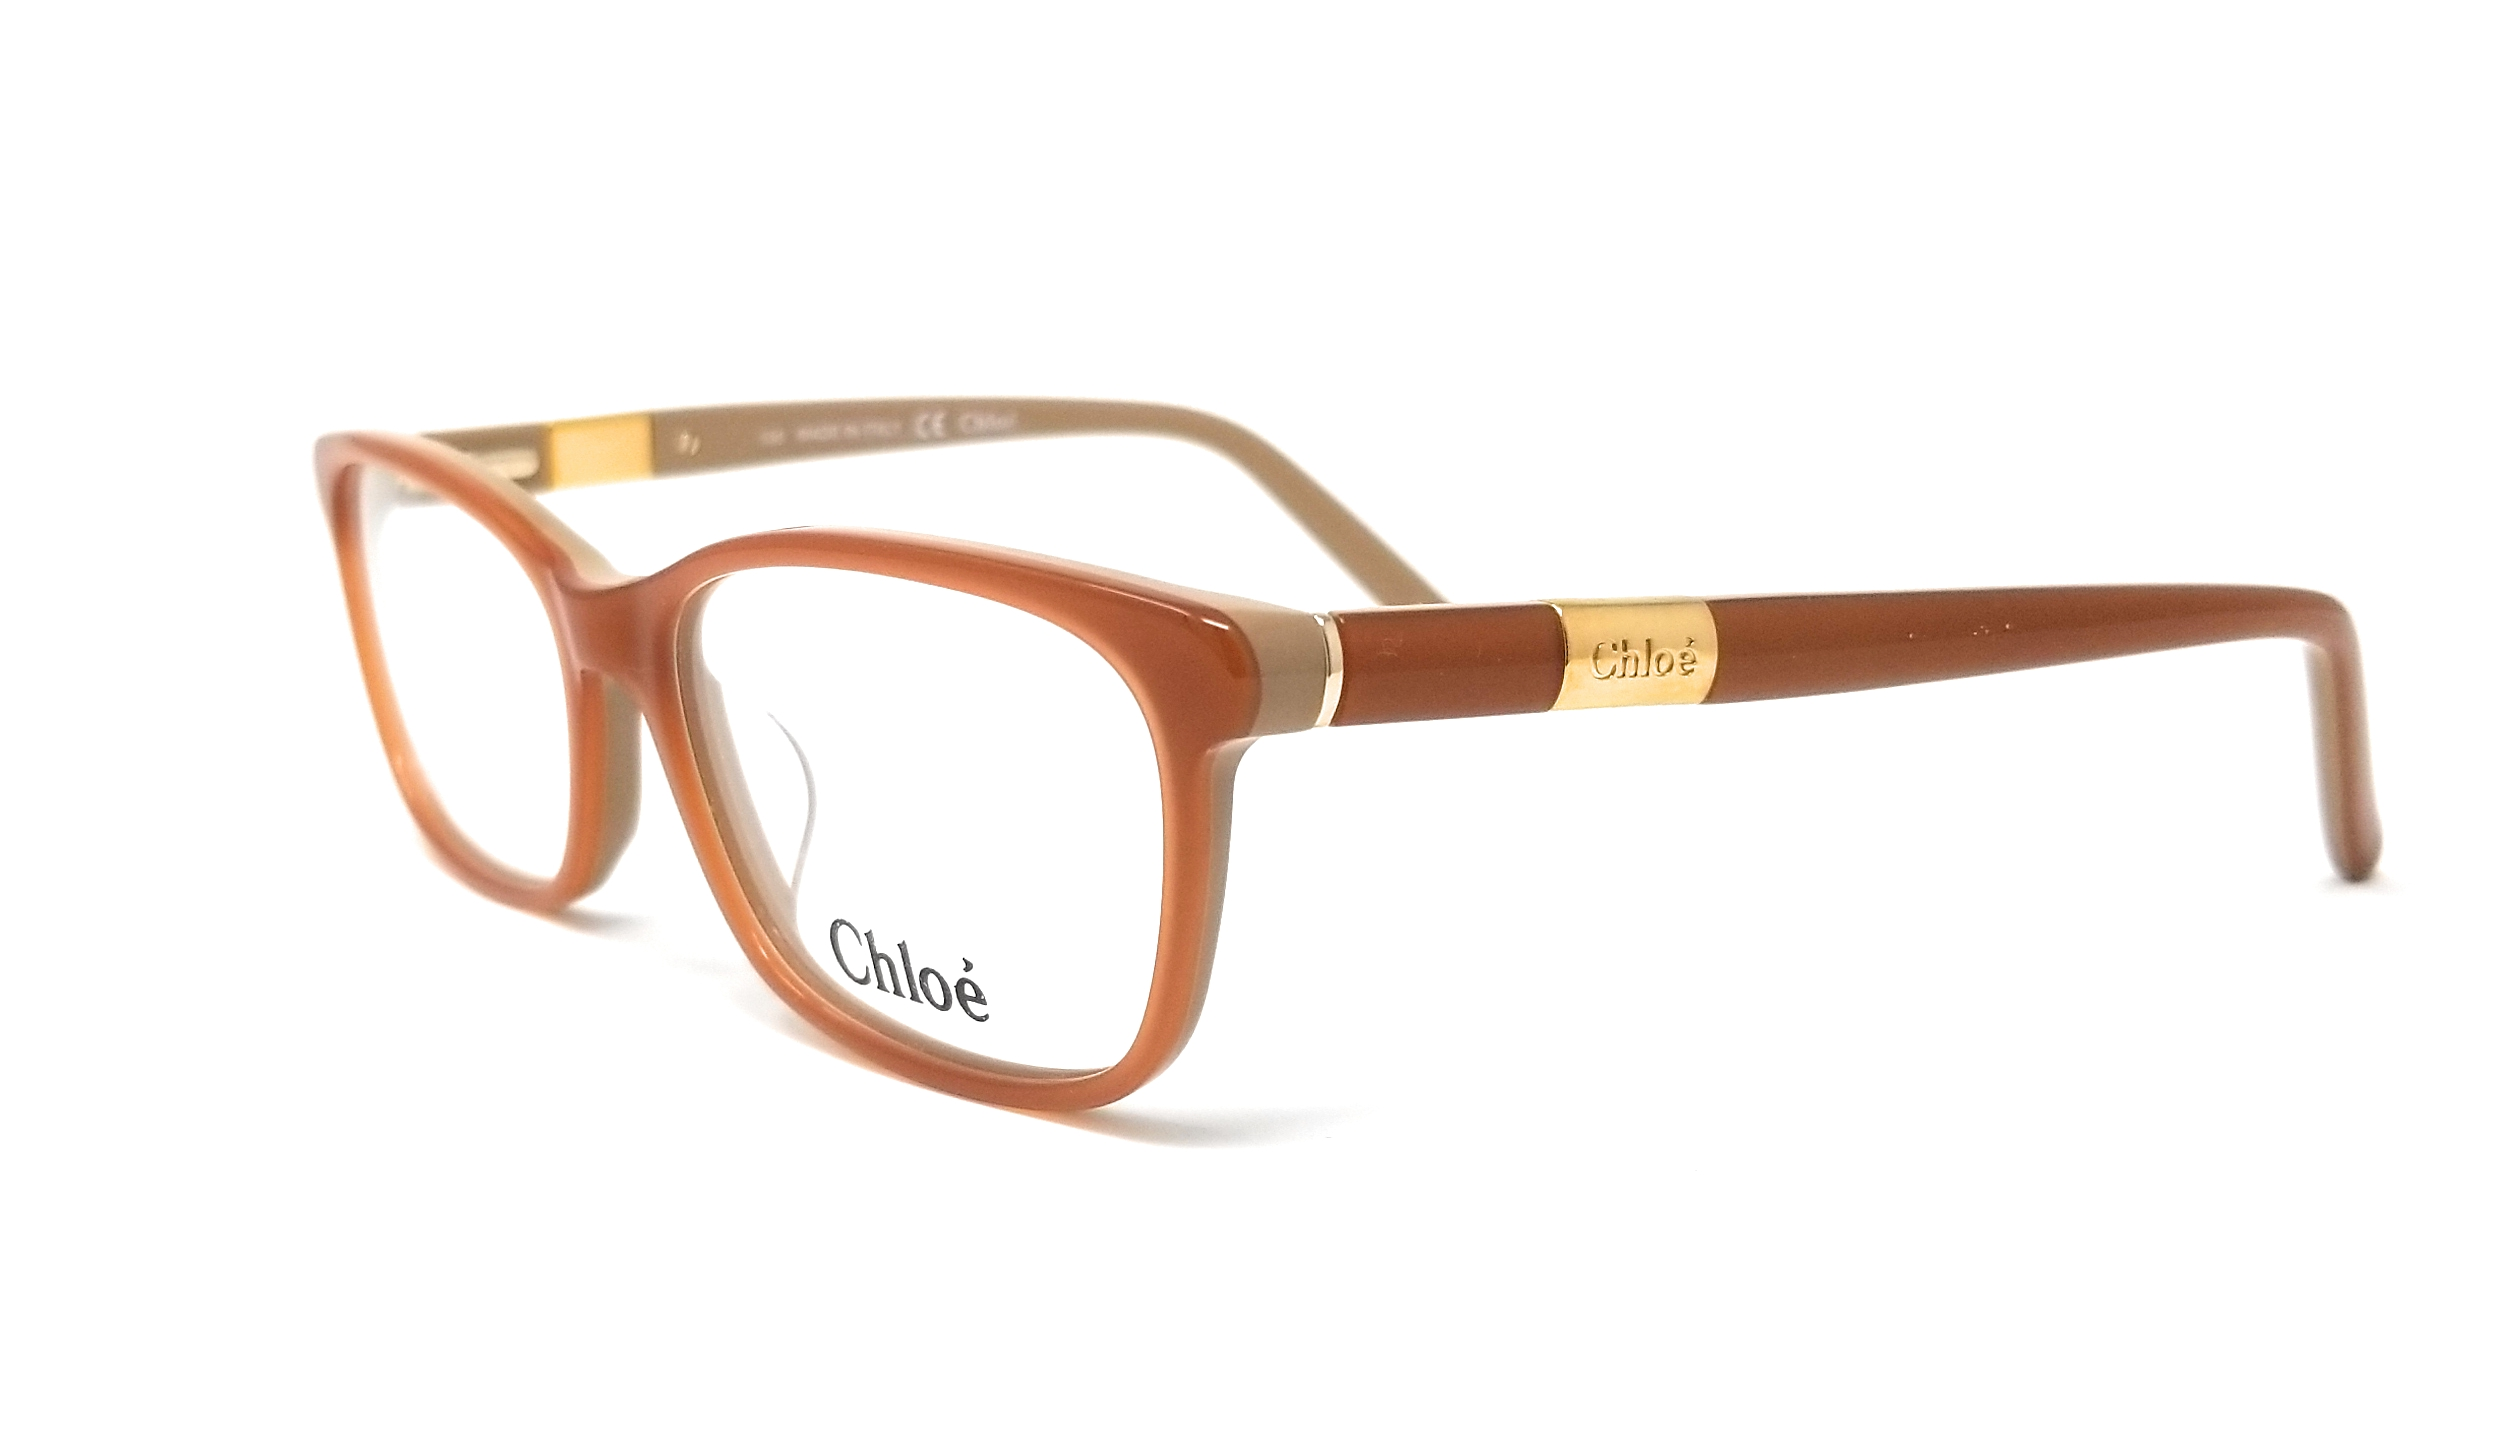 ddf36c417c6 Details about CHLOE Eyeglasses CE2628 749 Peach-Nude Rectangle 53x15x135